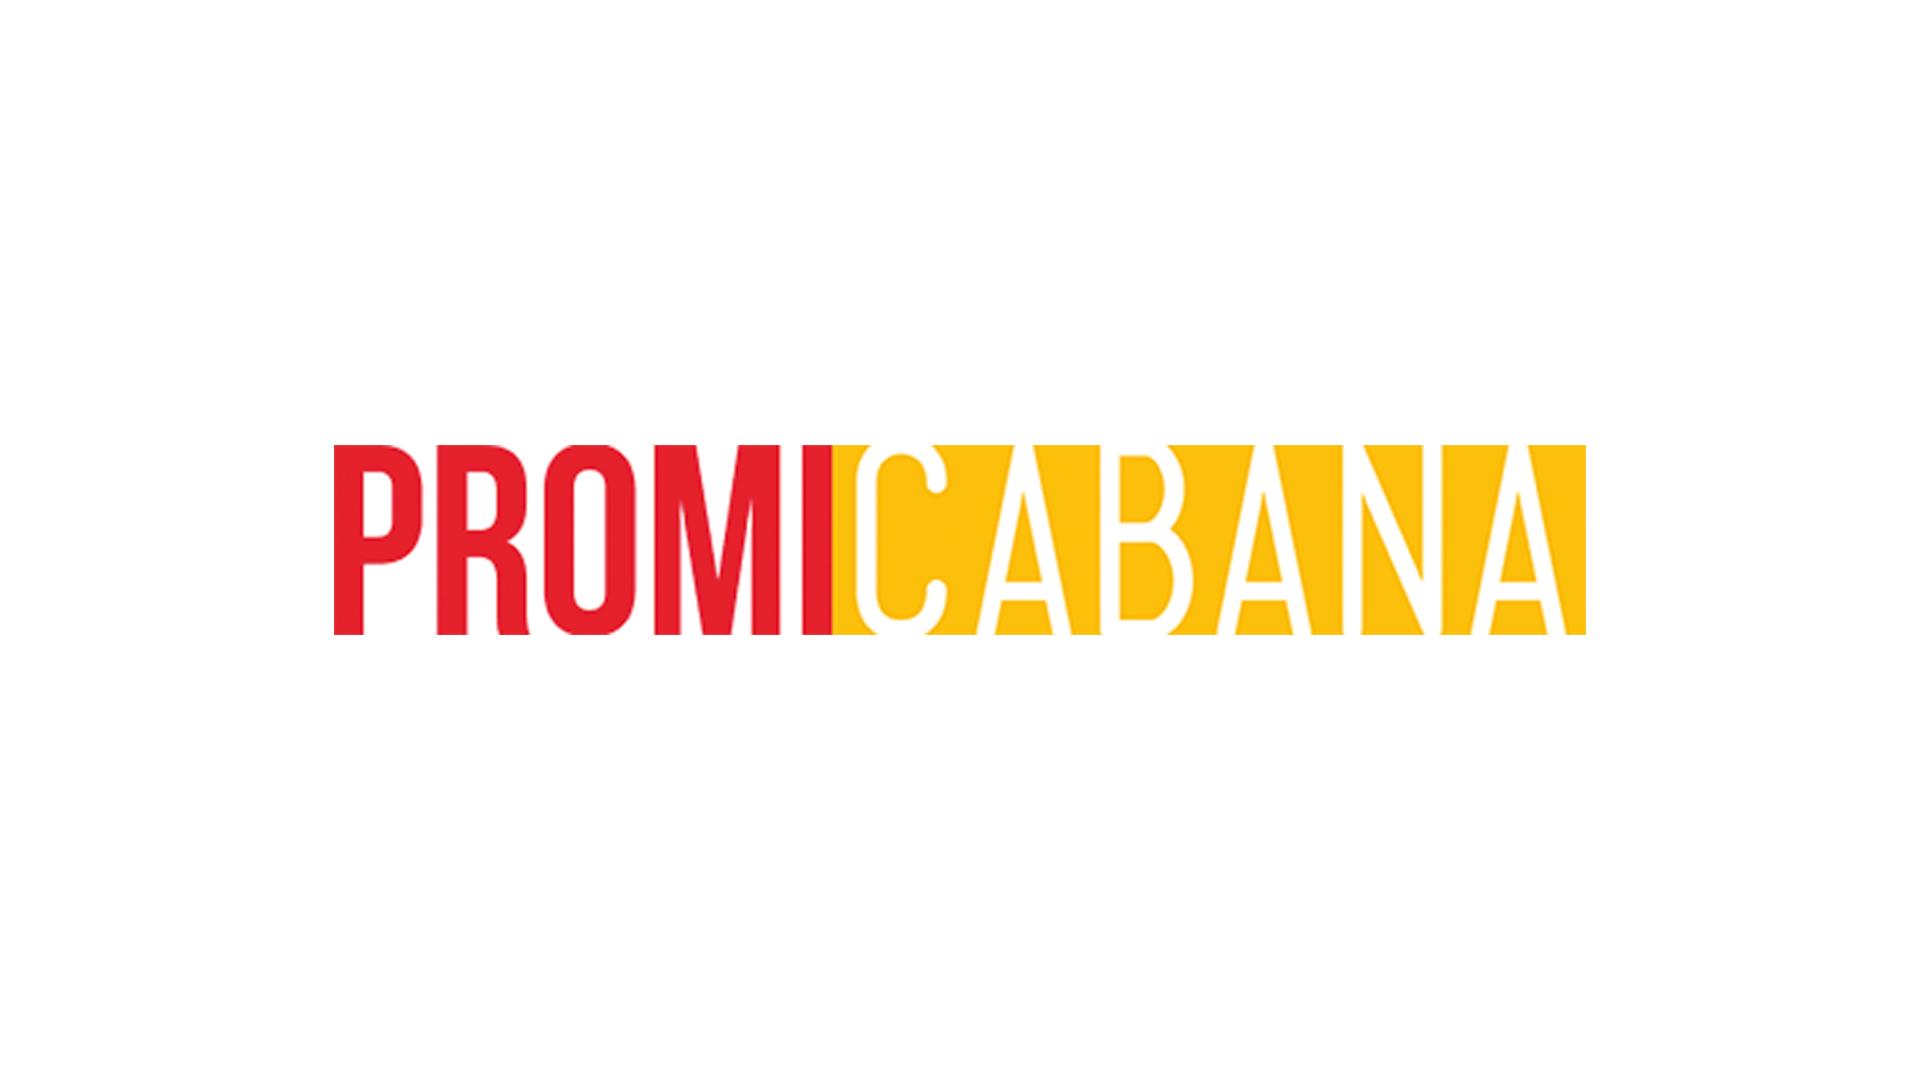 Kim-Kardashian-Familie-Kendall-Jenner-Kourtney-Kris